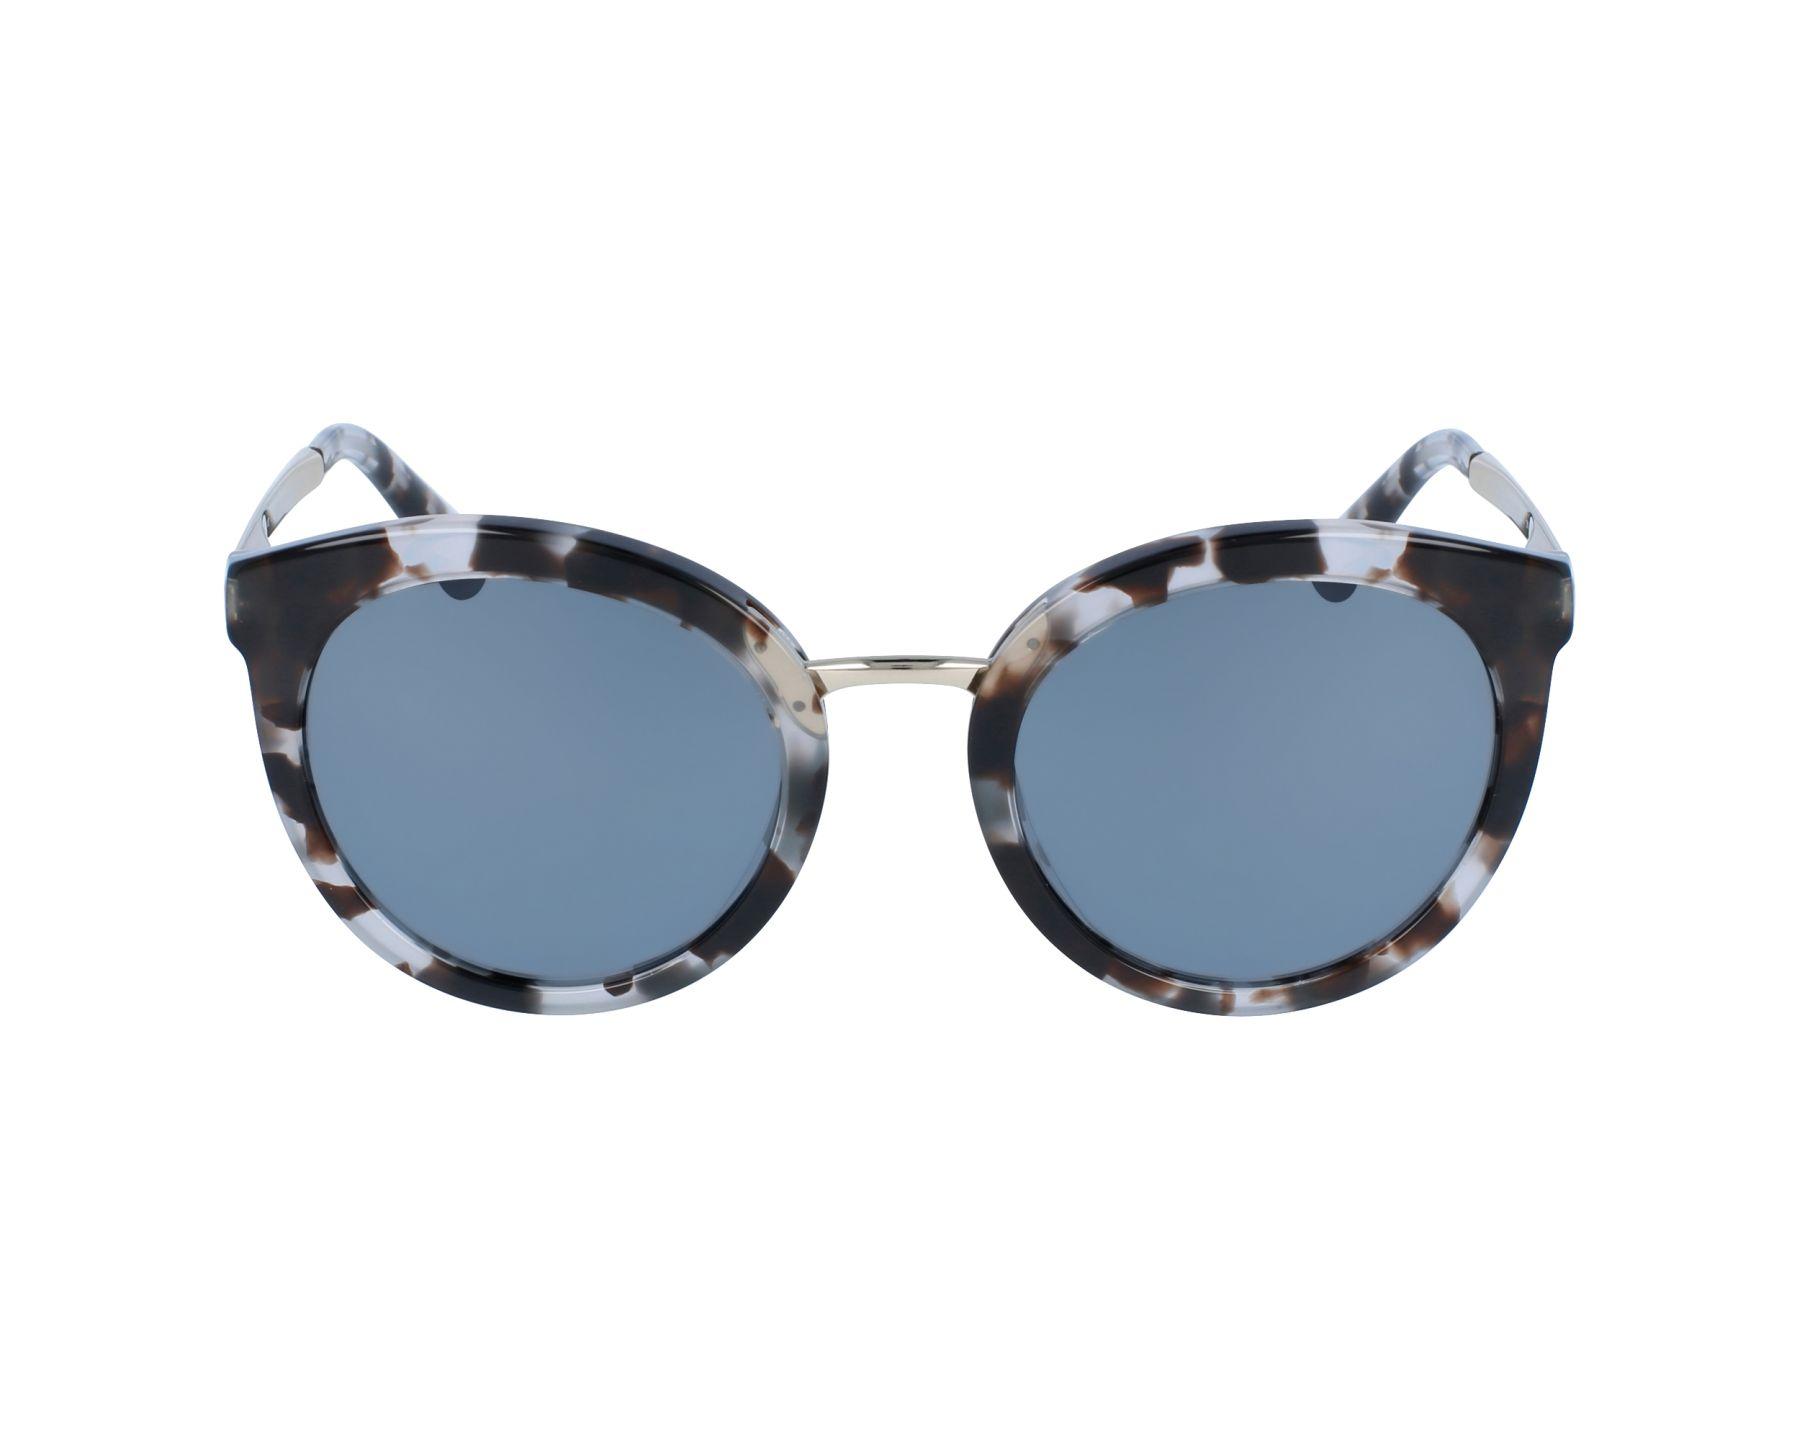 cheaper sale shop for genuine united states Dolce & Gabbana DG-4268 2888/6G